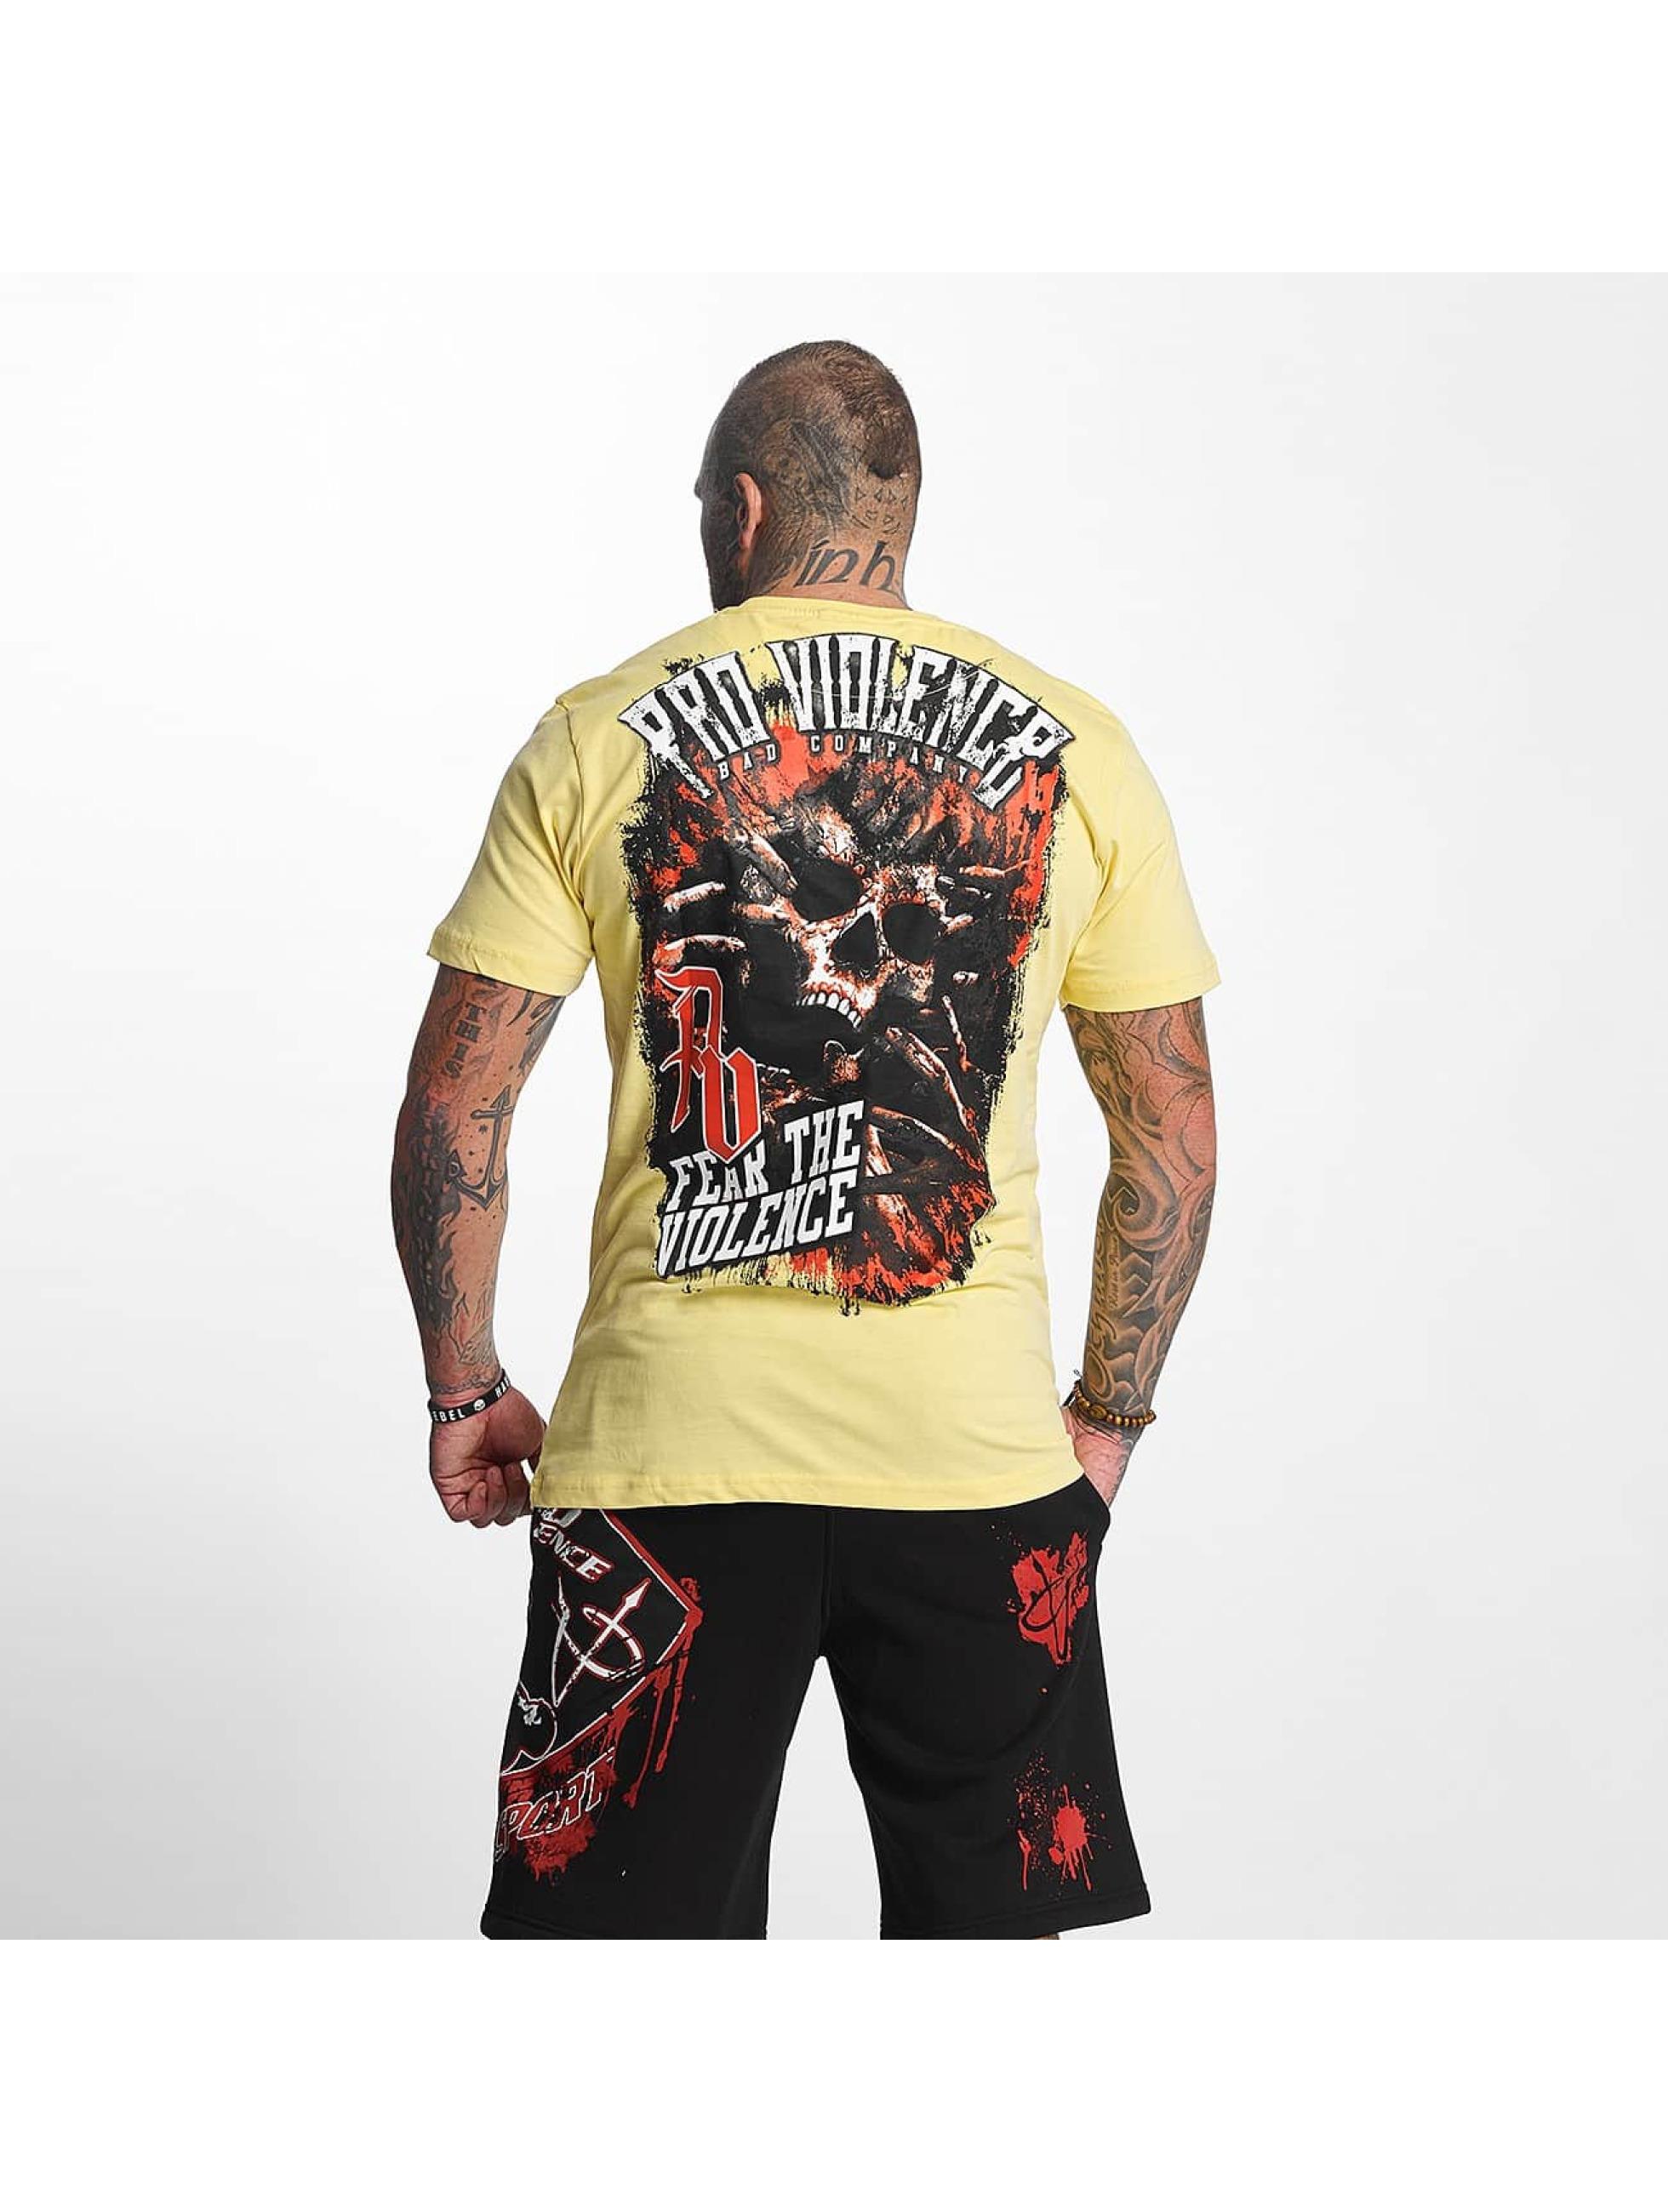 Pro Violence Streetwear Camiseta The Violence Fear amarillo